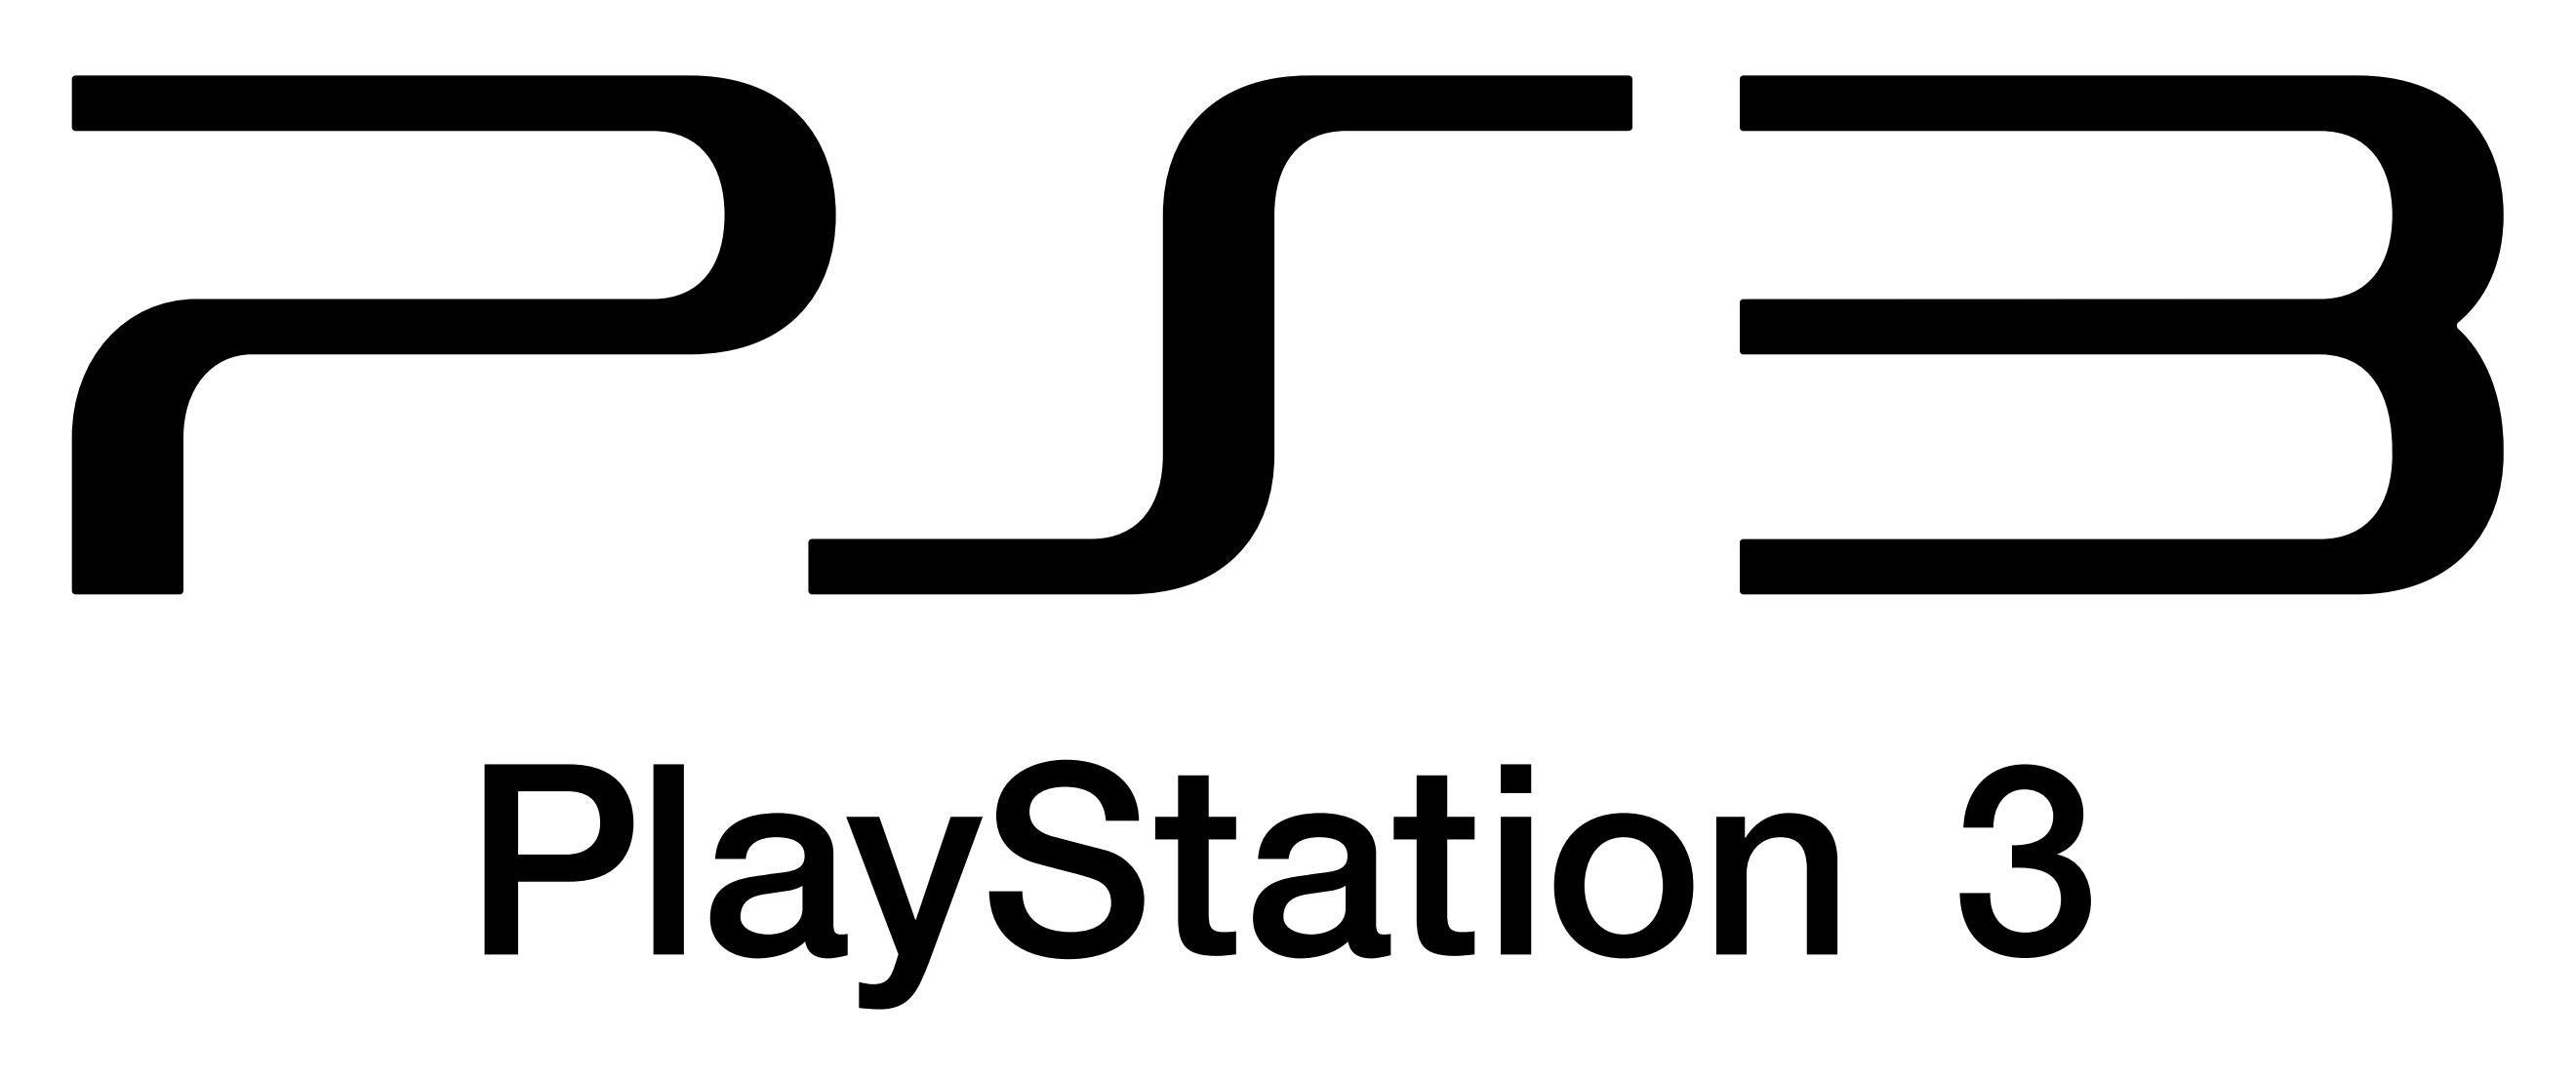 Ps3 Playstation 3 Logo Vector Eps File